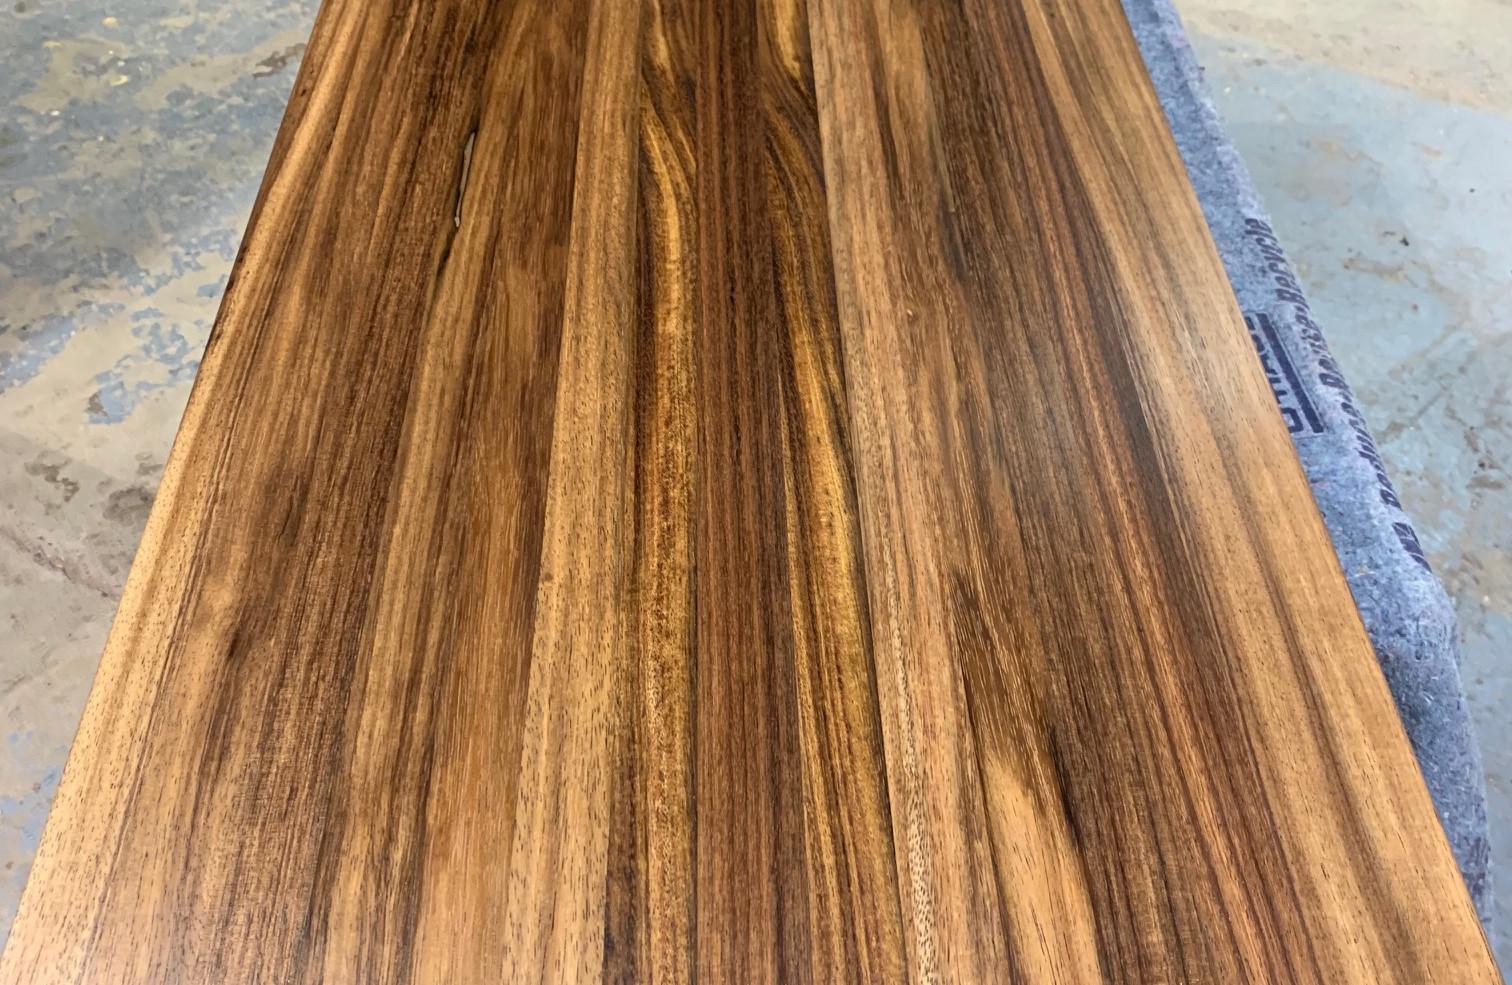 Cocowood table top .jpg